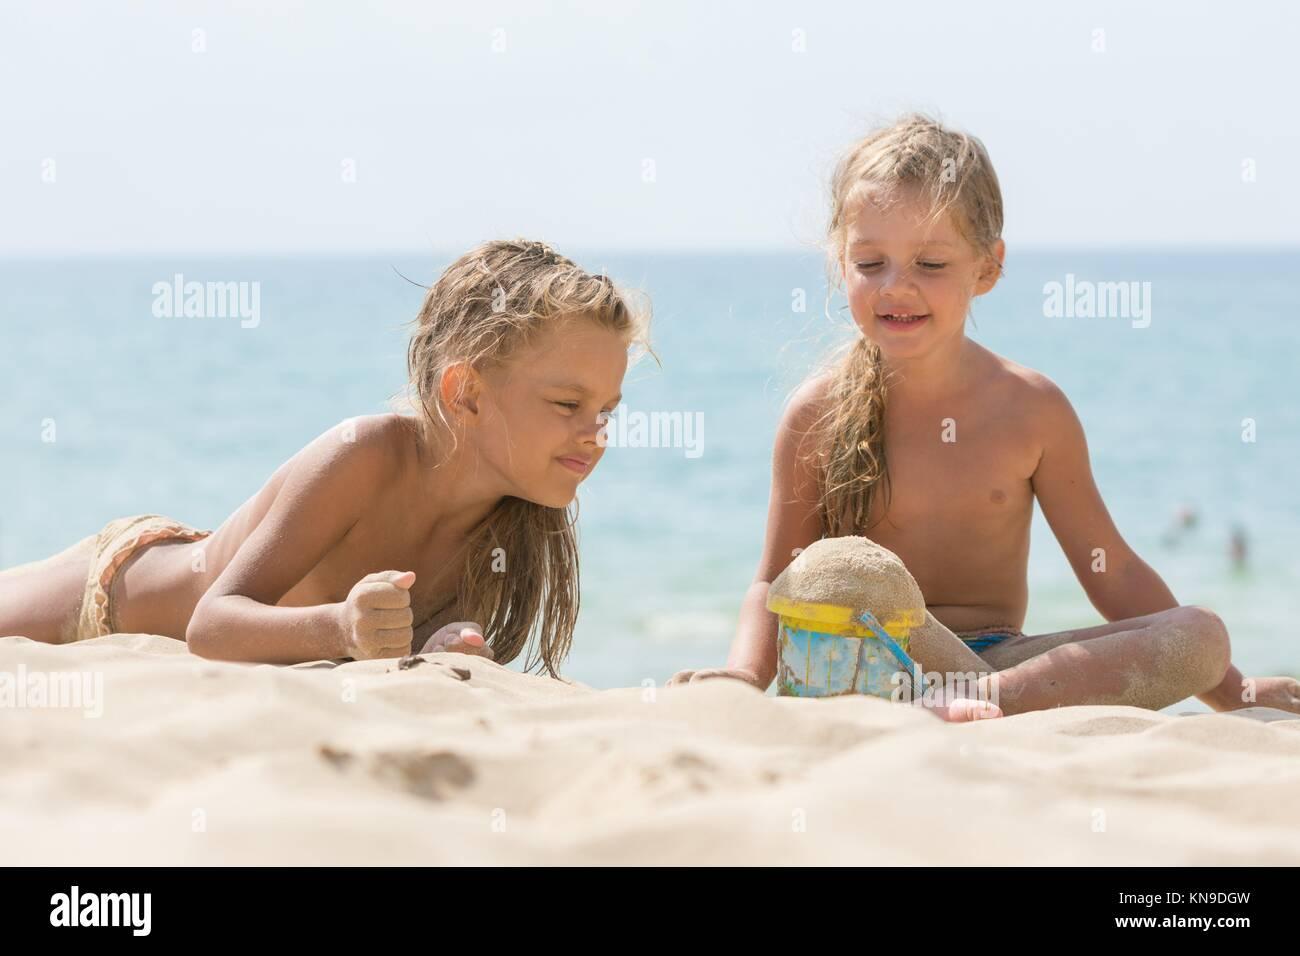 little girl sun Little Girl Sun Bathing On The Beach Stock Photo - Download Image Now